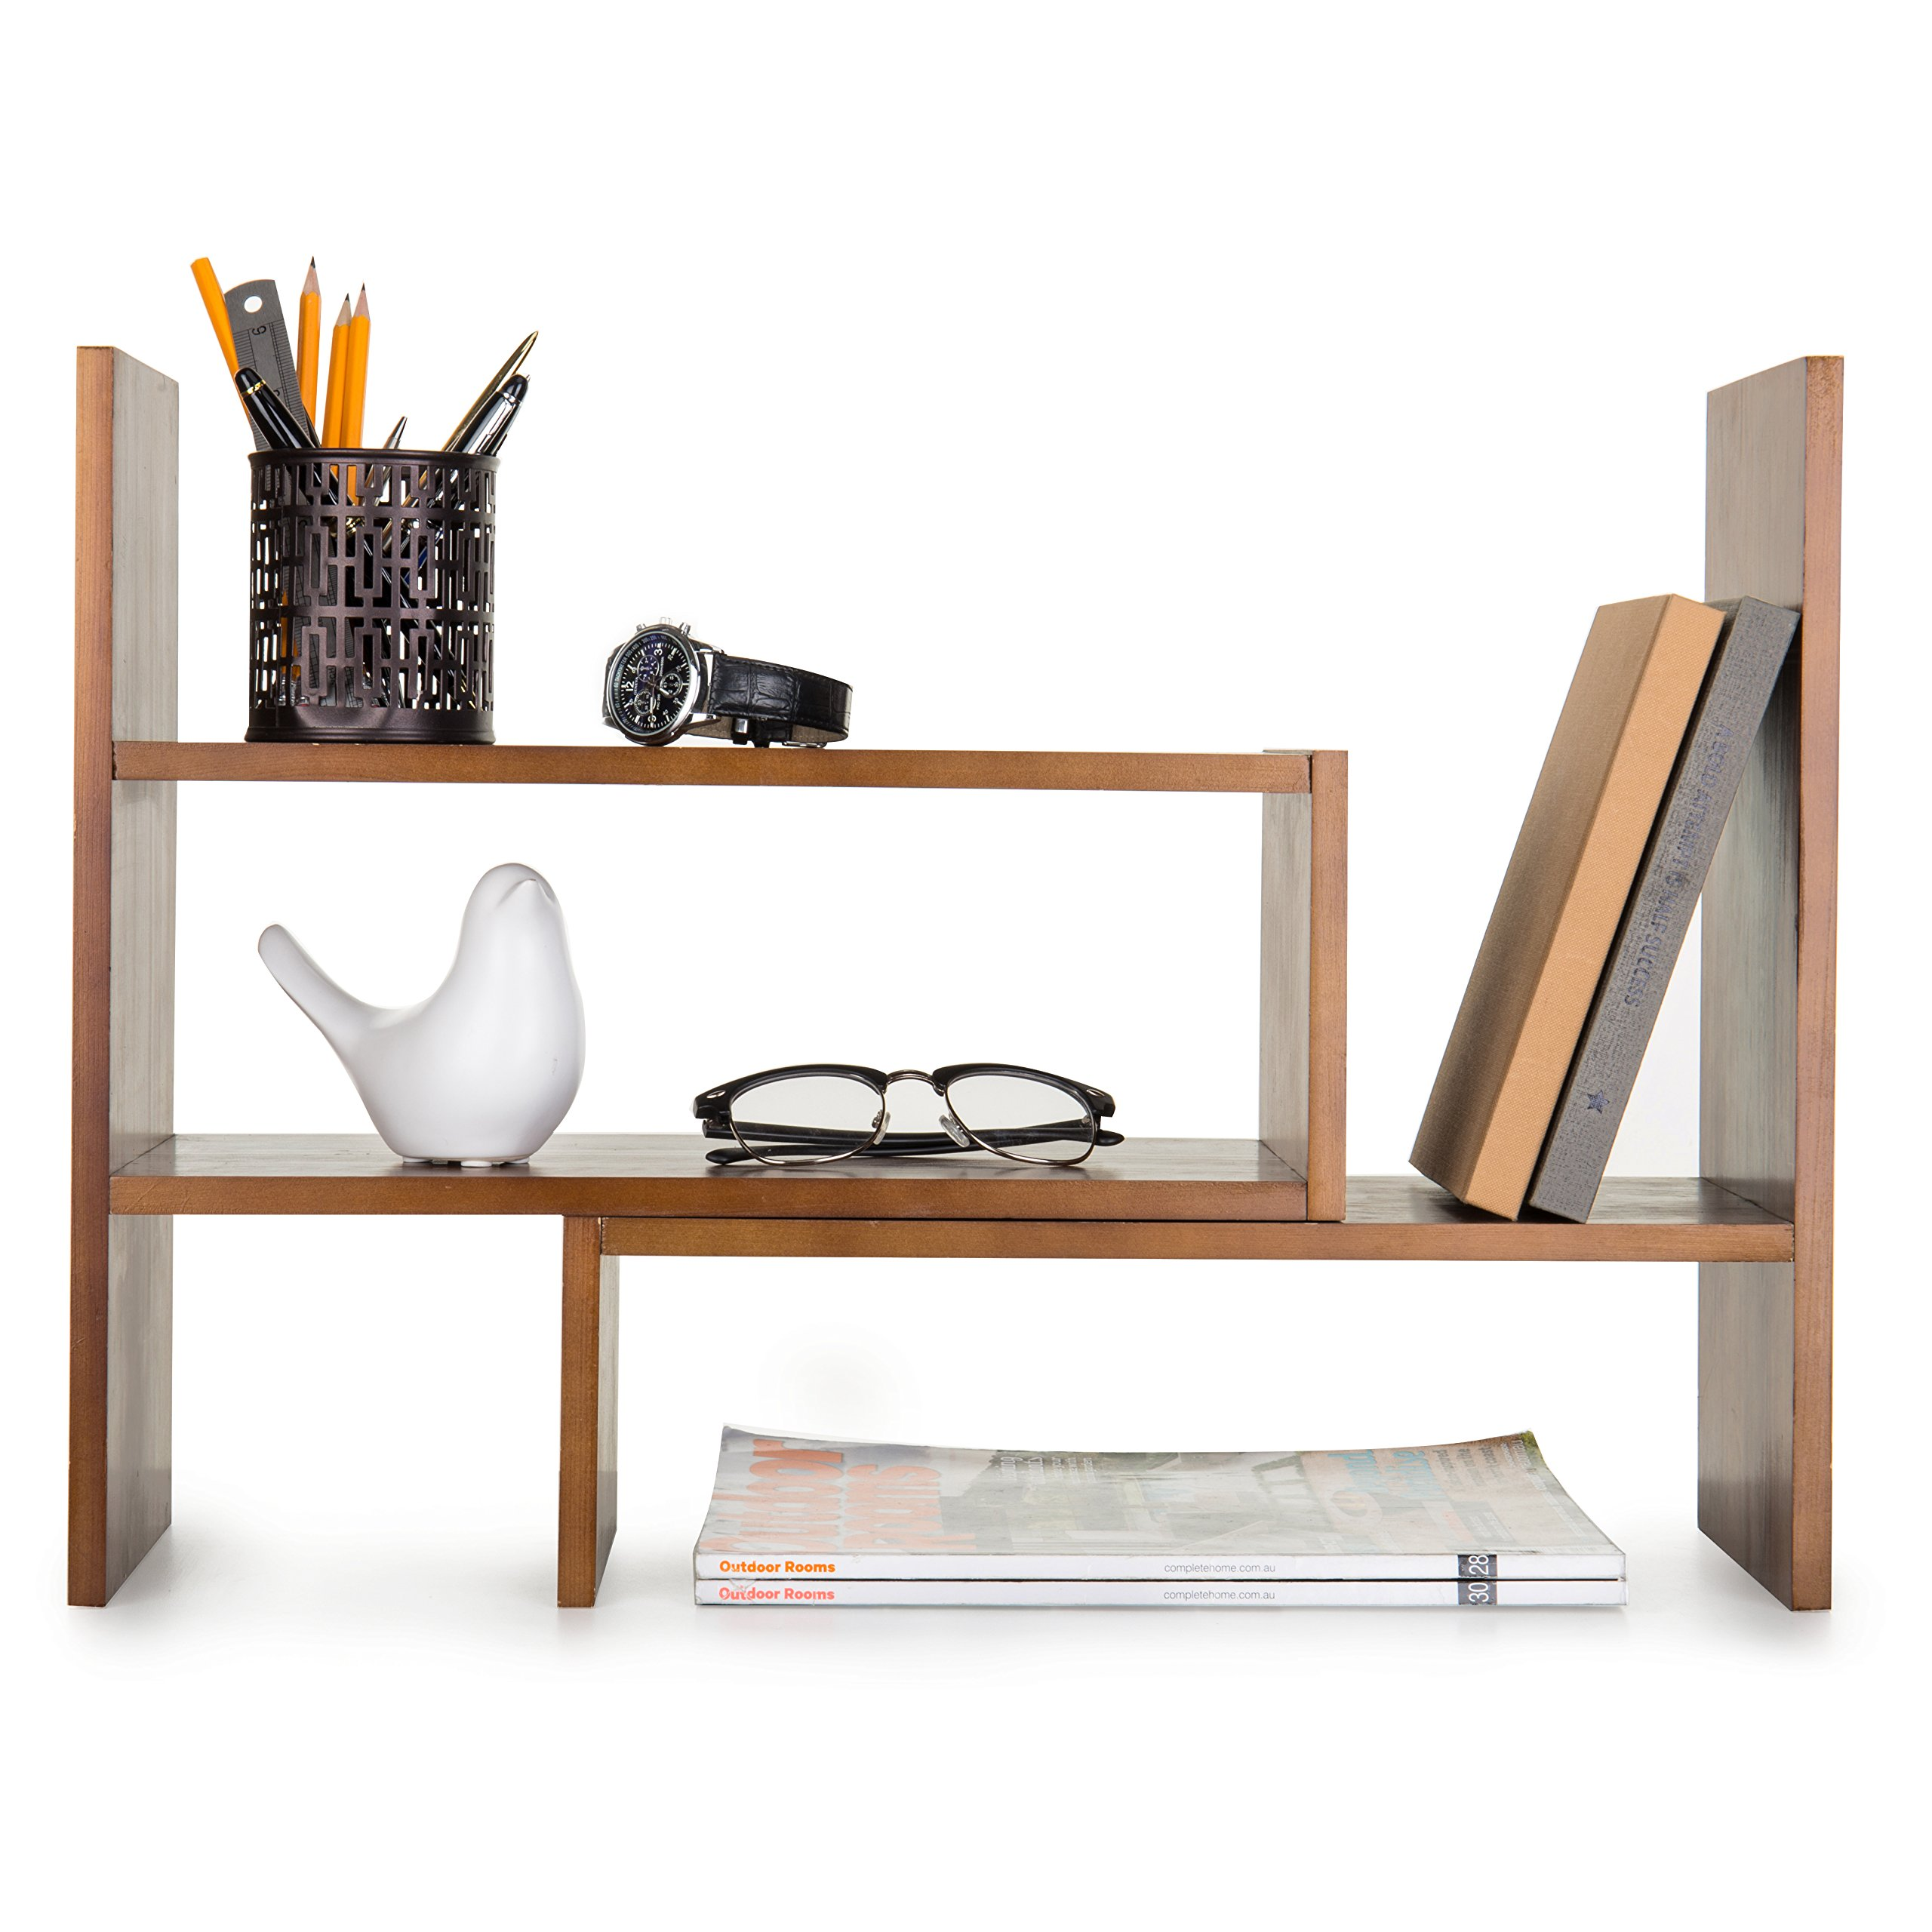 Adjustable Wood Desktop Storage Organizer Display Shelf Rack, Counter Top Bookcase, Brown by MyGift